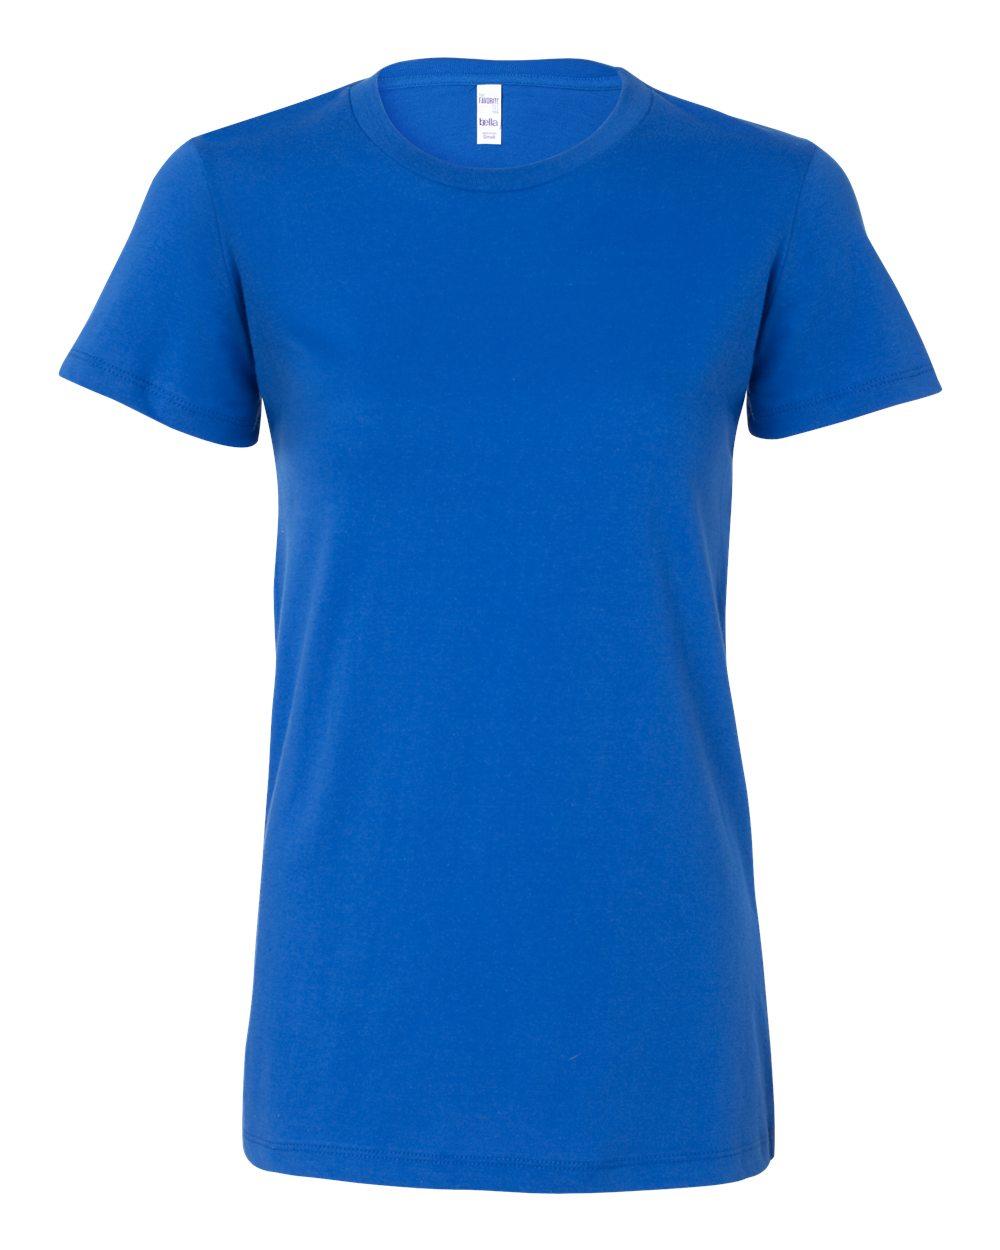 Bella-Canvas-Women-039-s-Favorite-T-Shirt-6004-S-2XL thumbnail 137